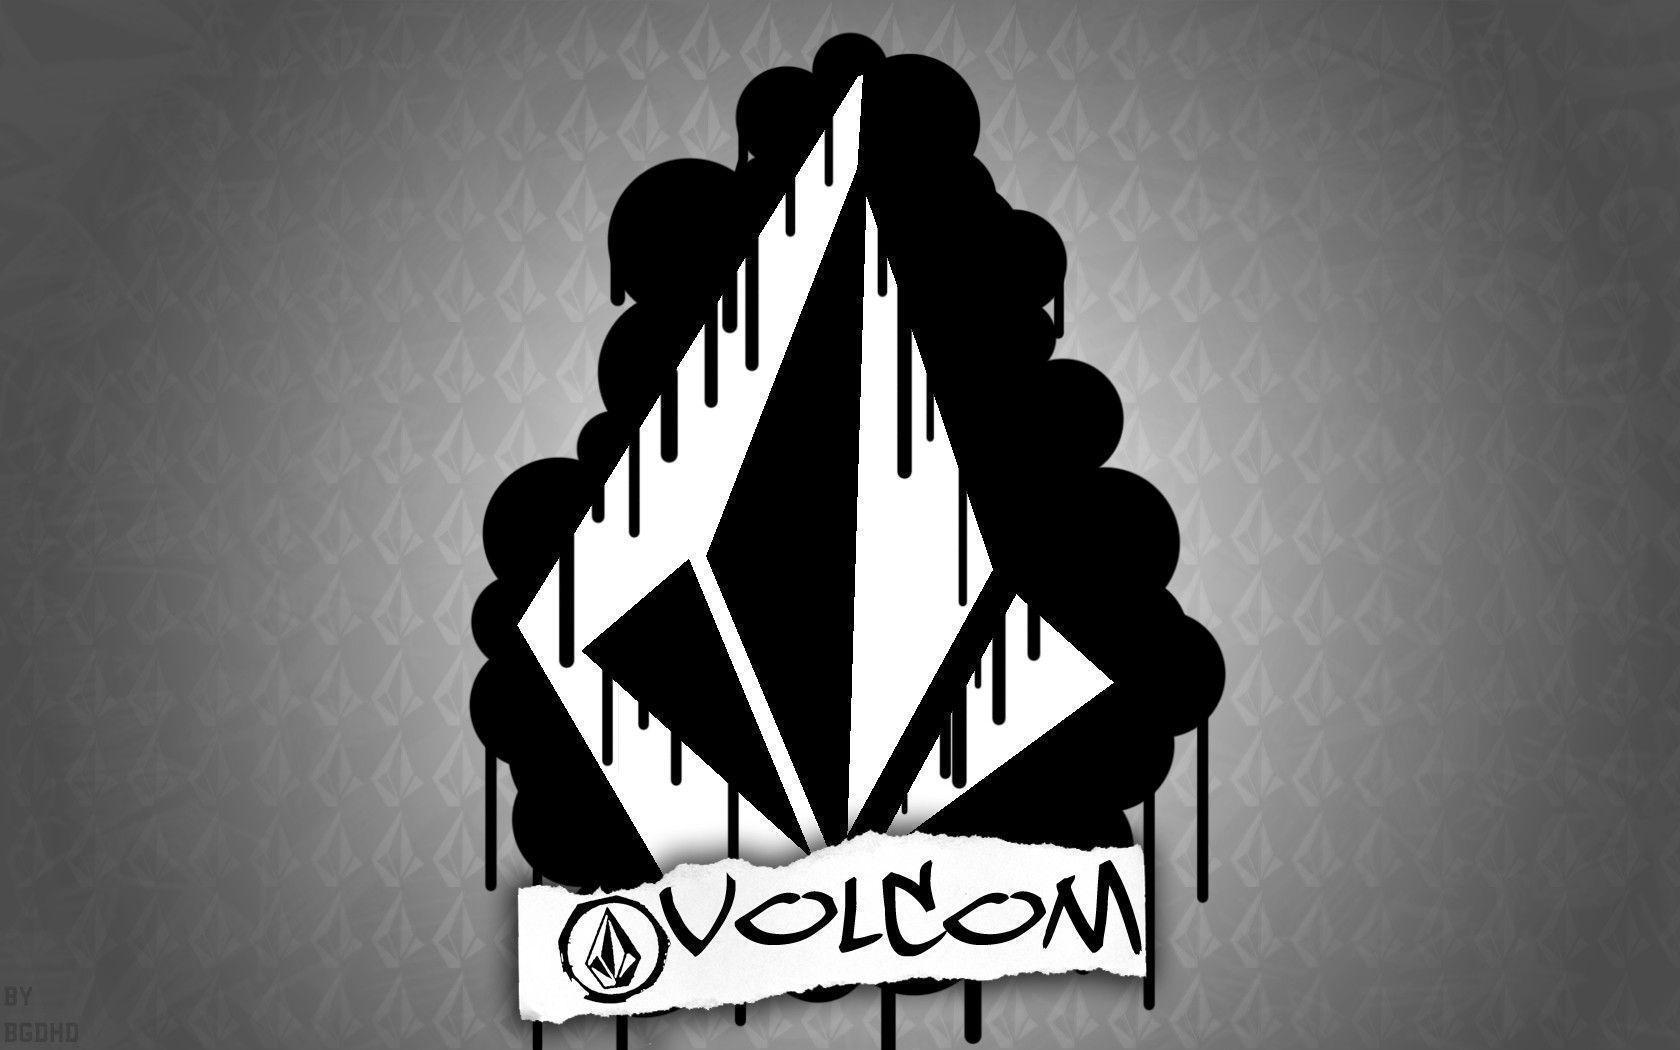 volcom logo wallpapers wallpaper cave